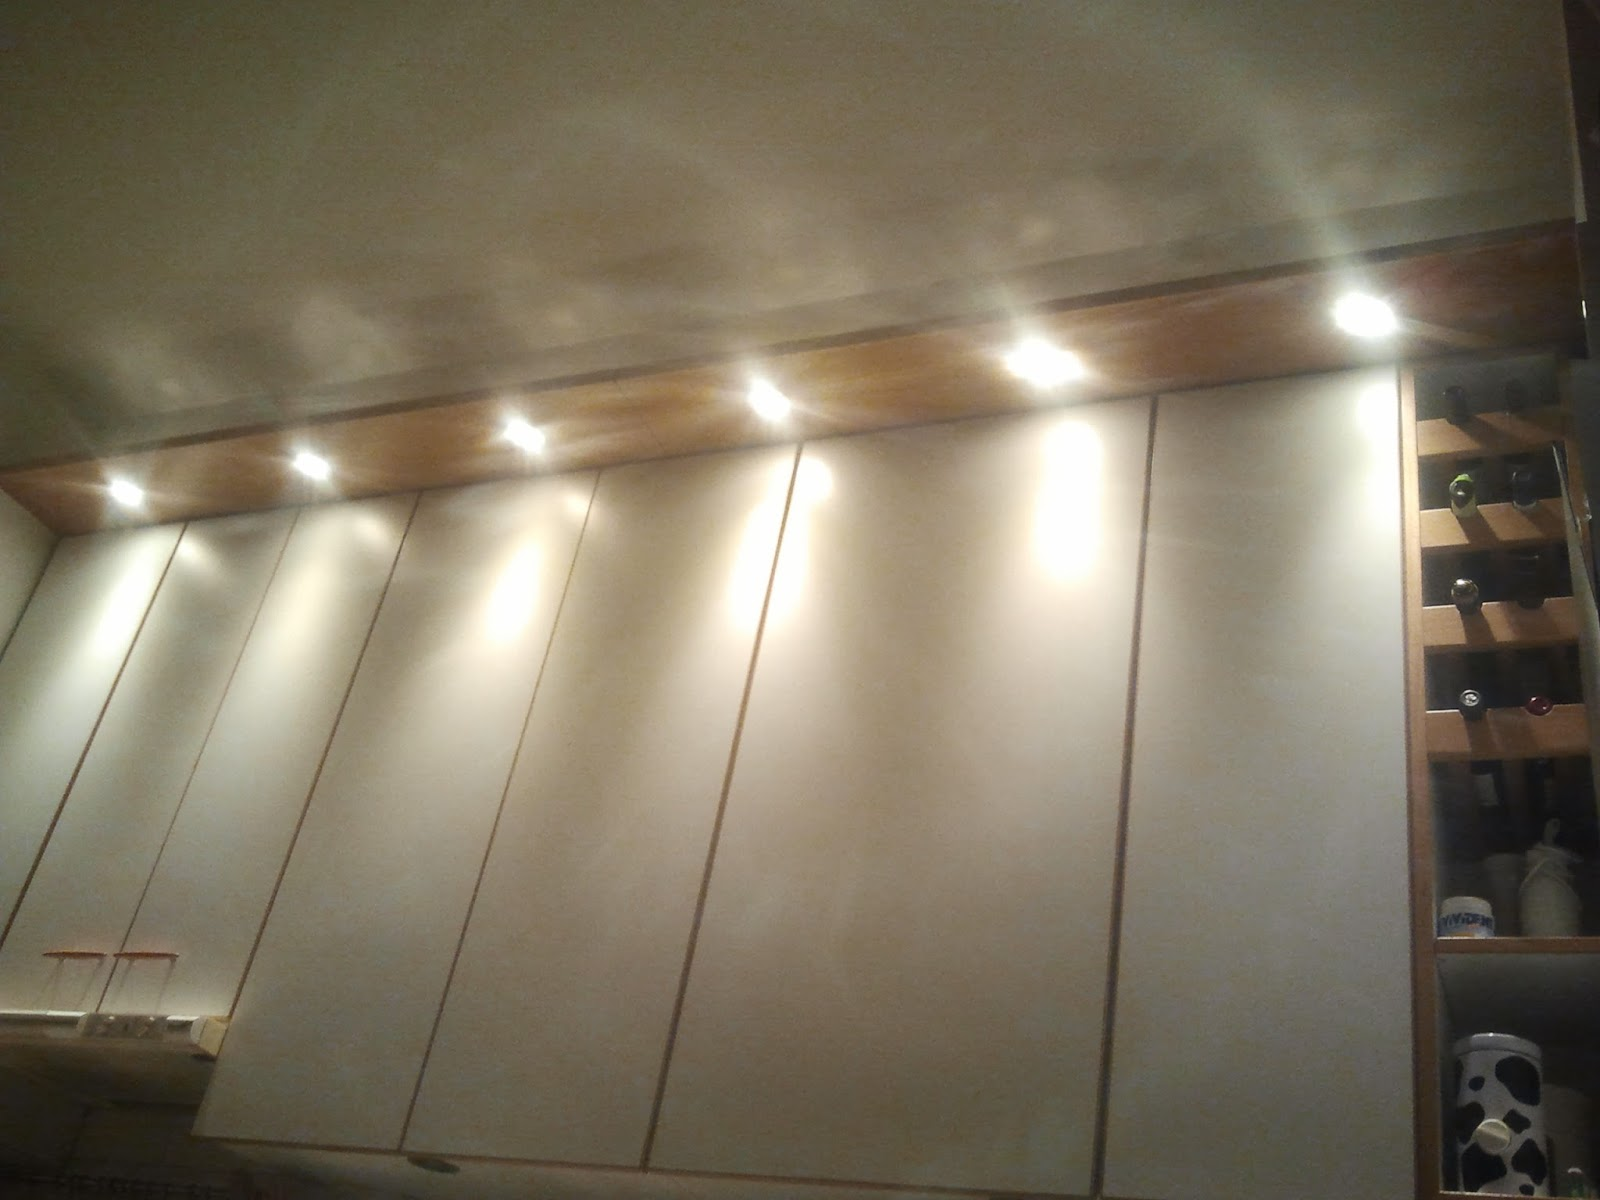 Luci da soffitto basso pietro ippoliti thorndyke klarstein